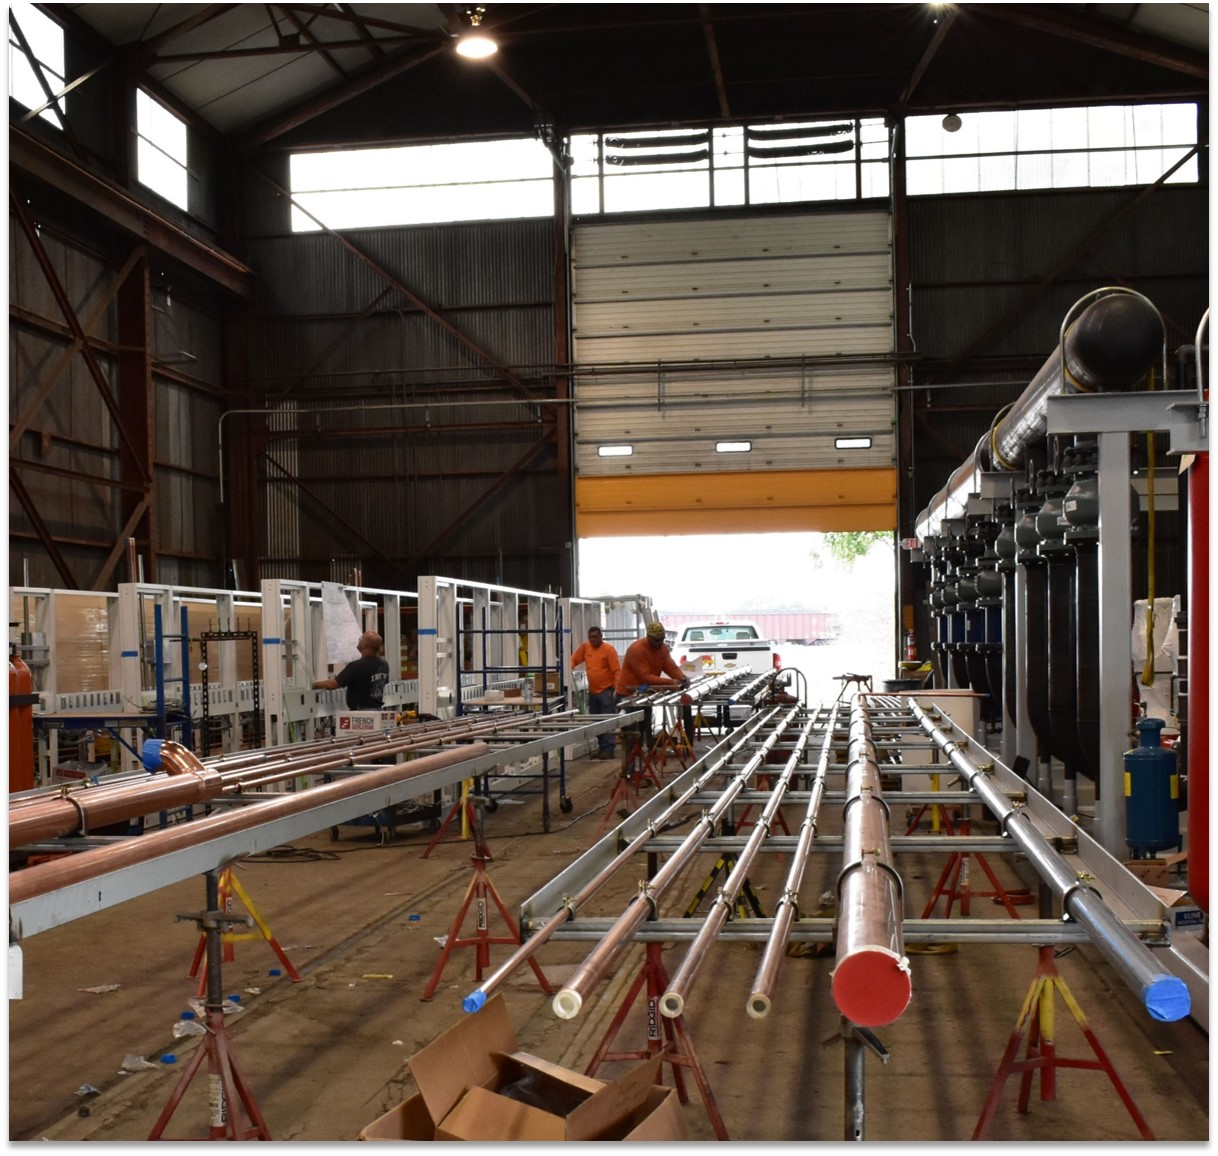 Pfizer R Amp D And Process Development Facility